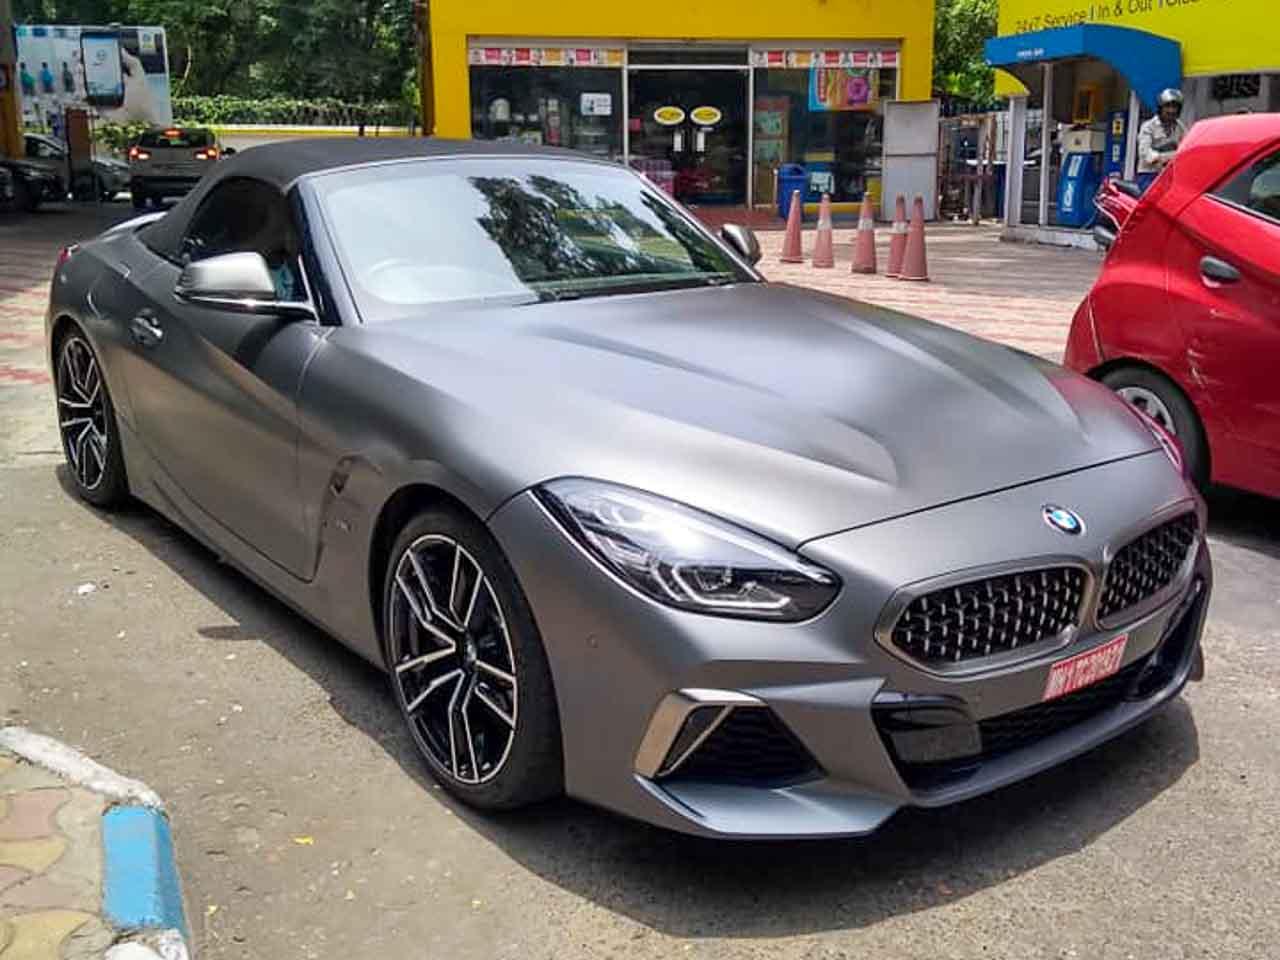 Luxury Car Sales July 2020 At 933 Units Mercedes Bmw Audi Jlr